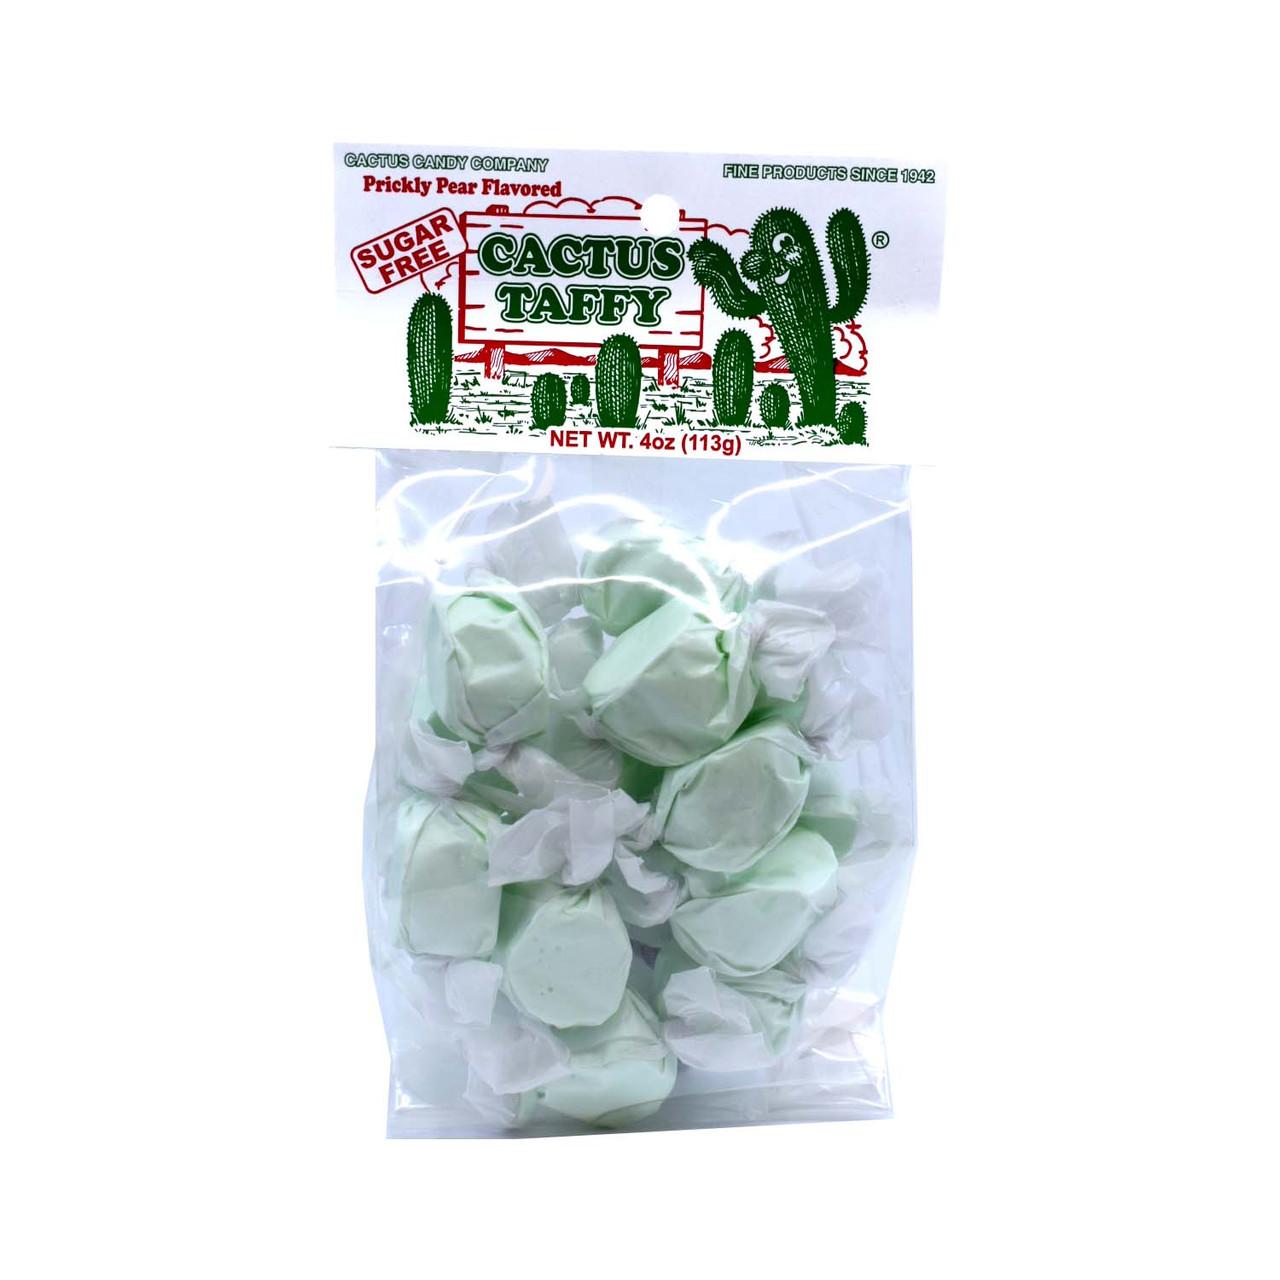 Sugar Free Prickly Pear Taffy Bag